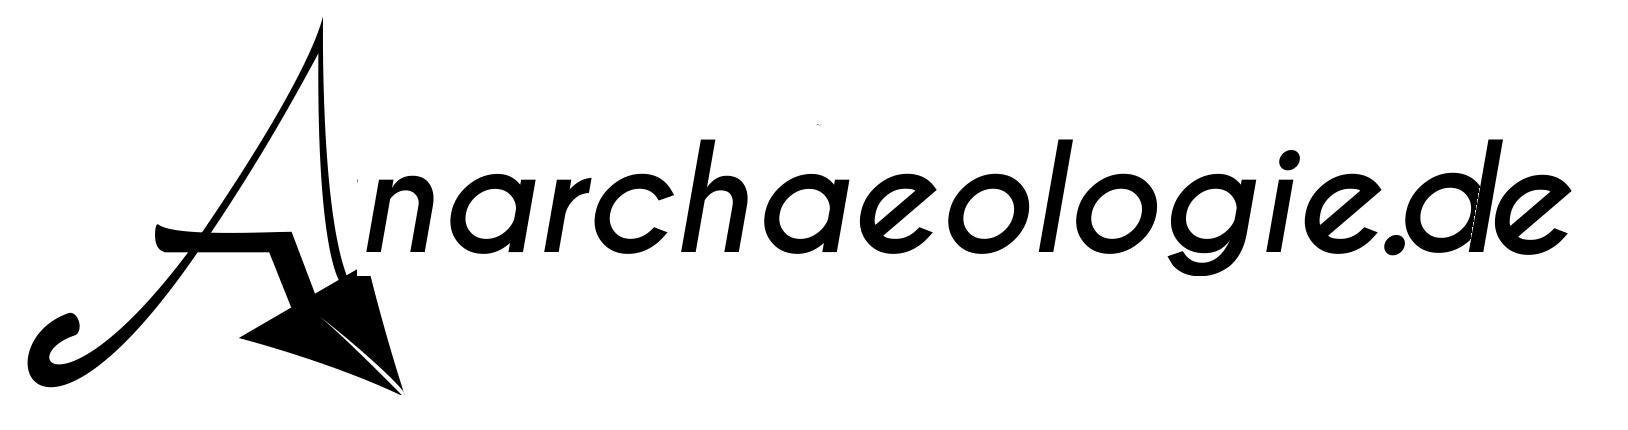 anarchaeologie1 – Kopie (2)